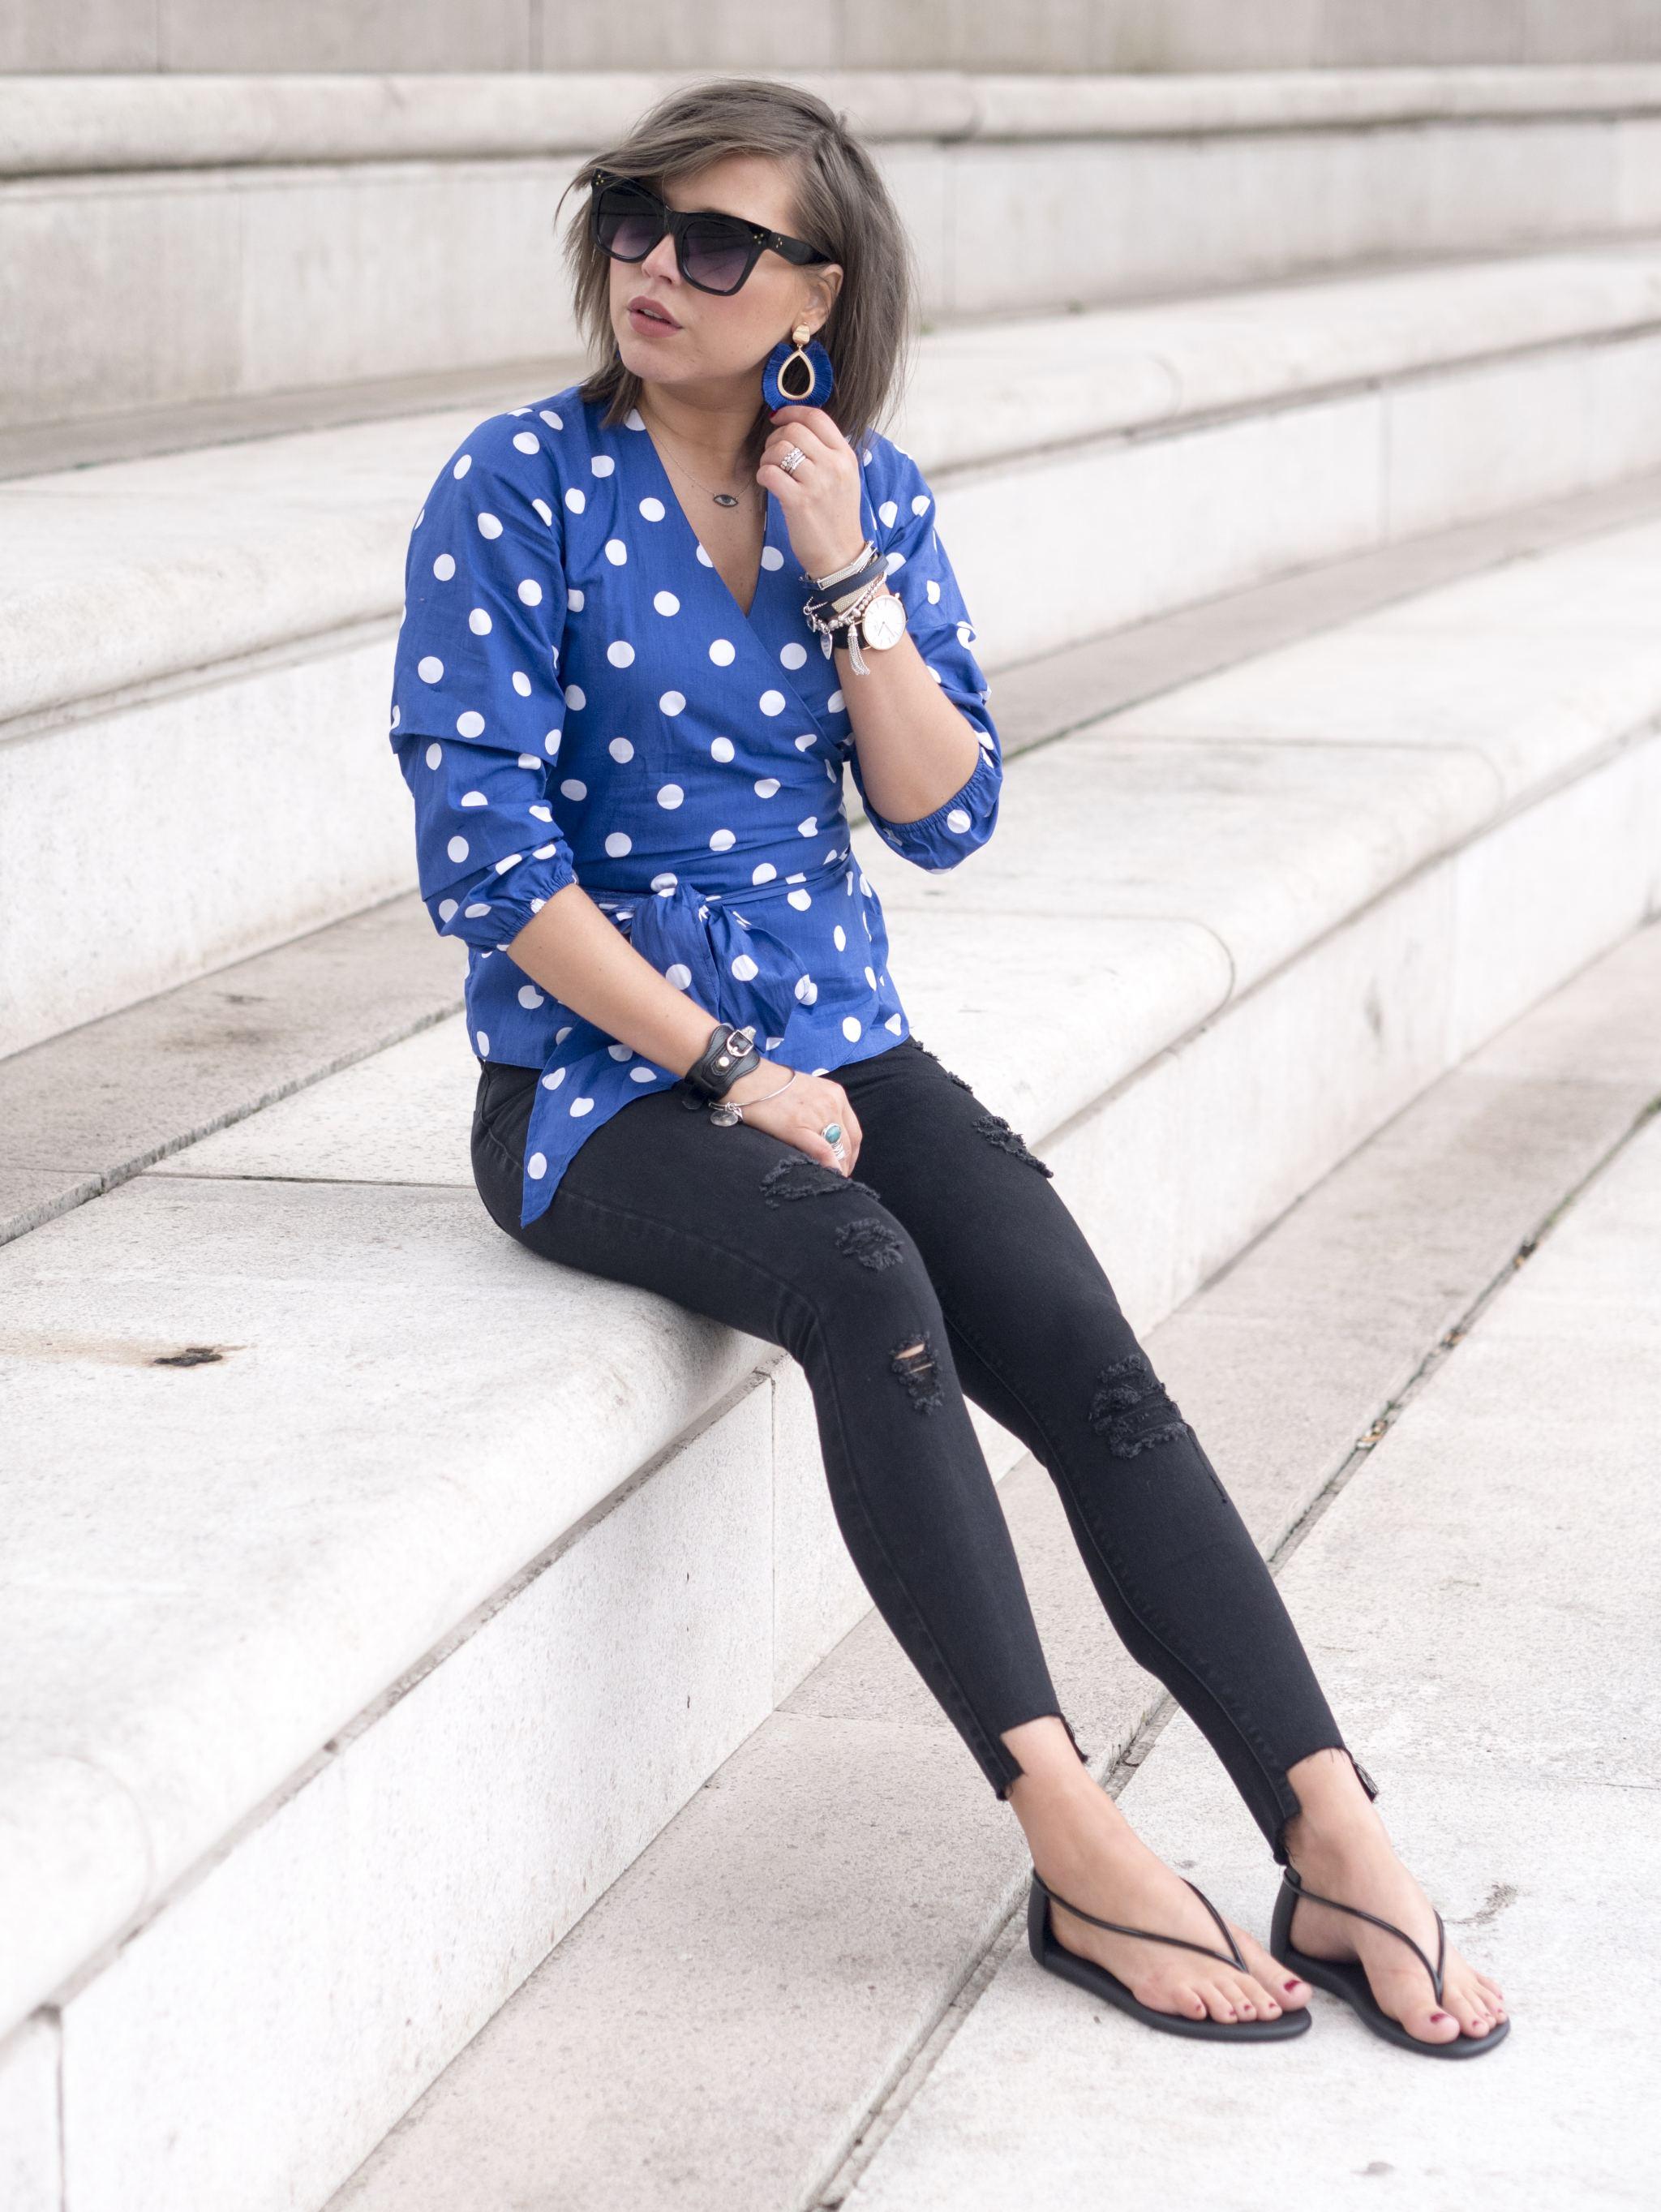 manchester fashion blogger, manchester fashion, fashion blogger, Ipanema x Philippe Starck, Ipanema sandals, ipanema flip flops